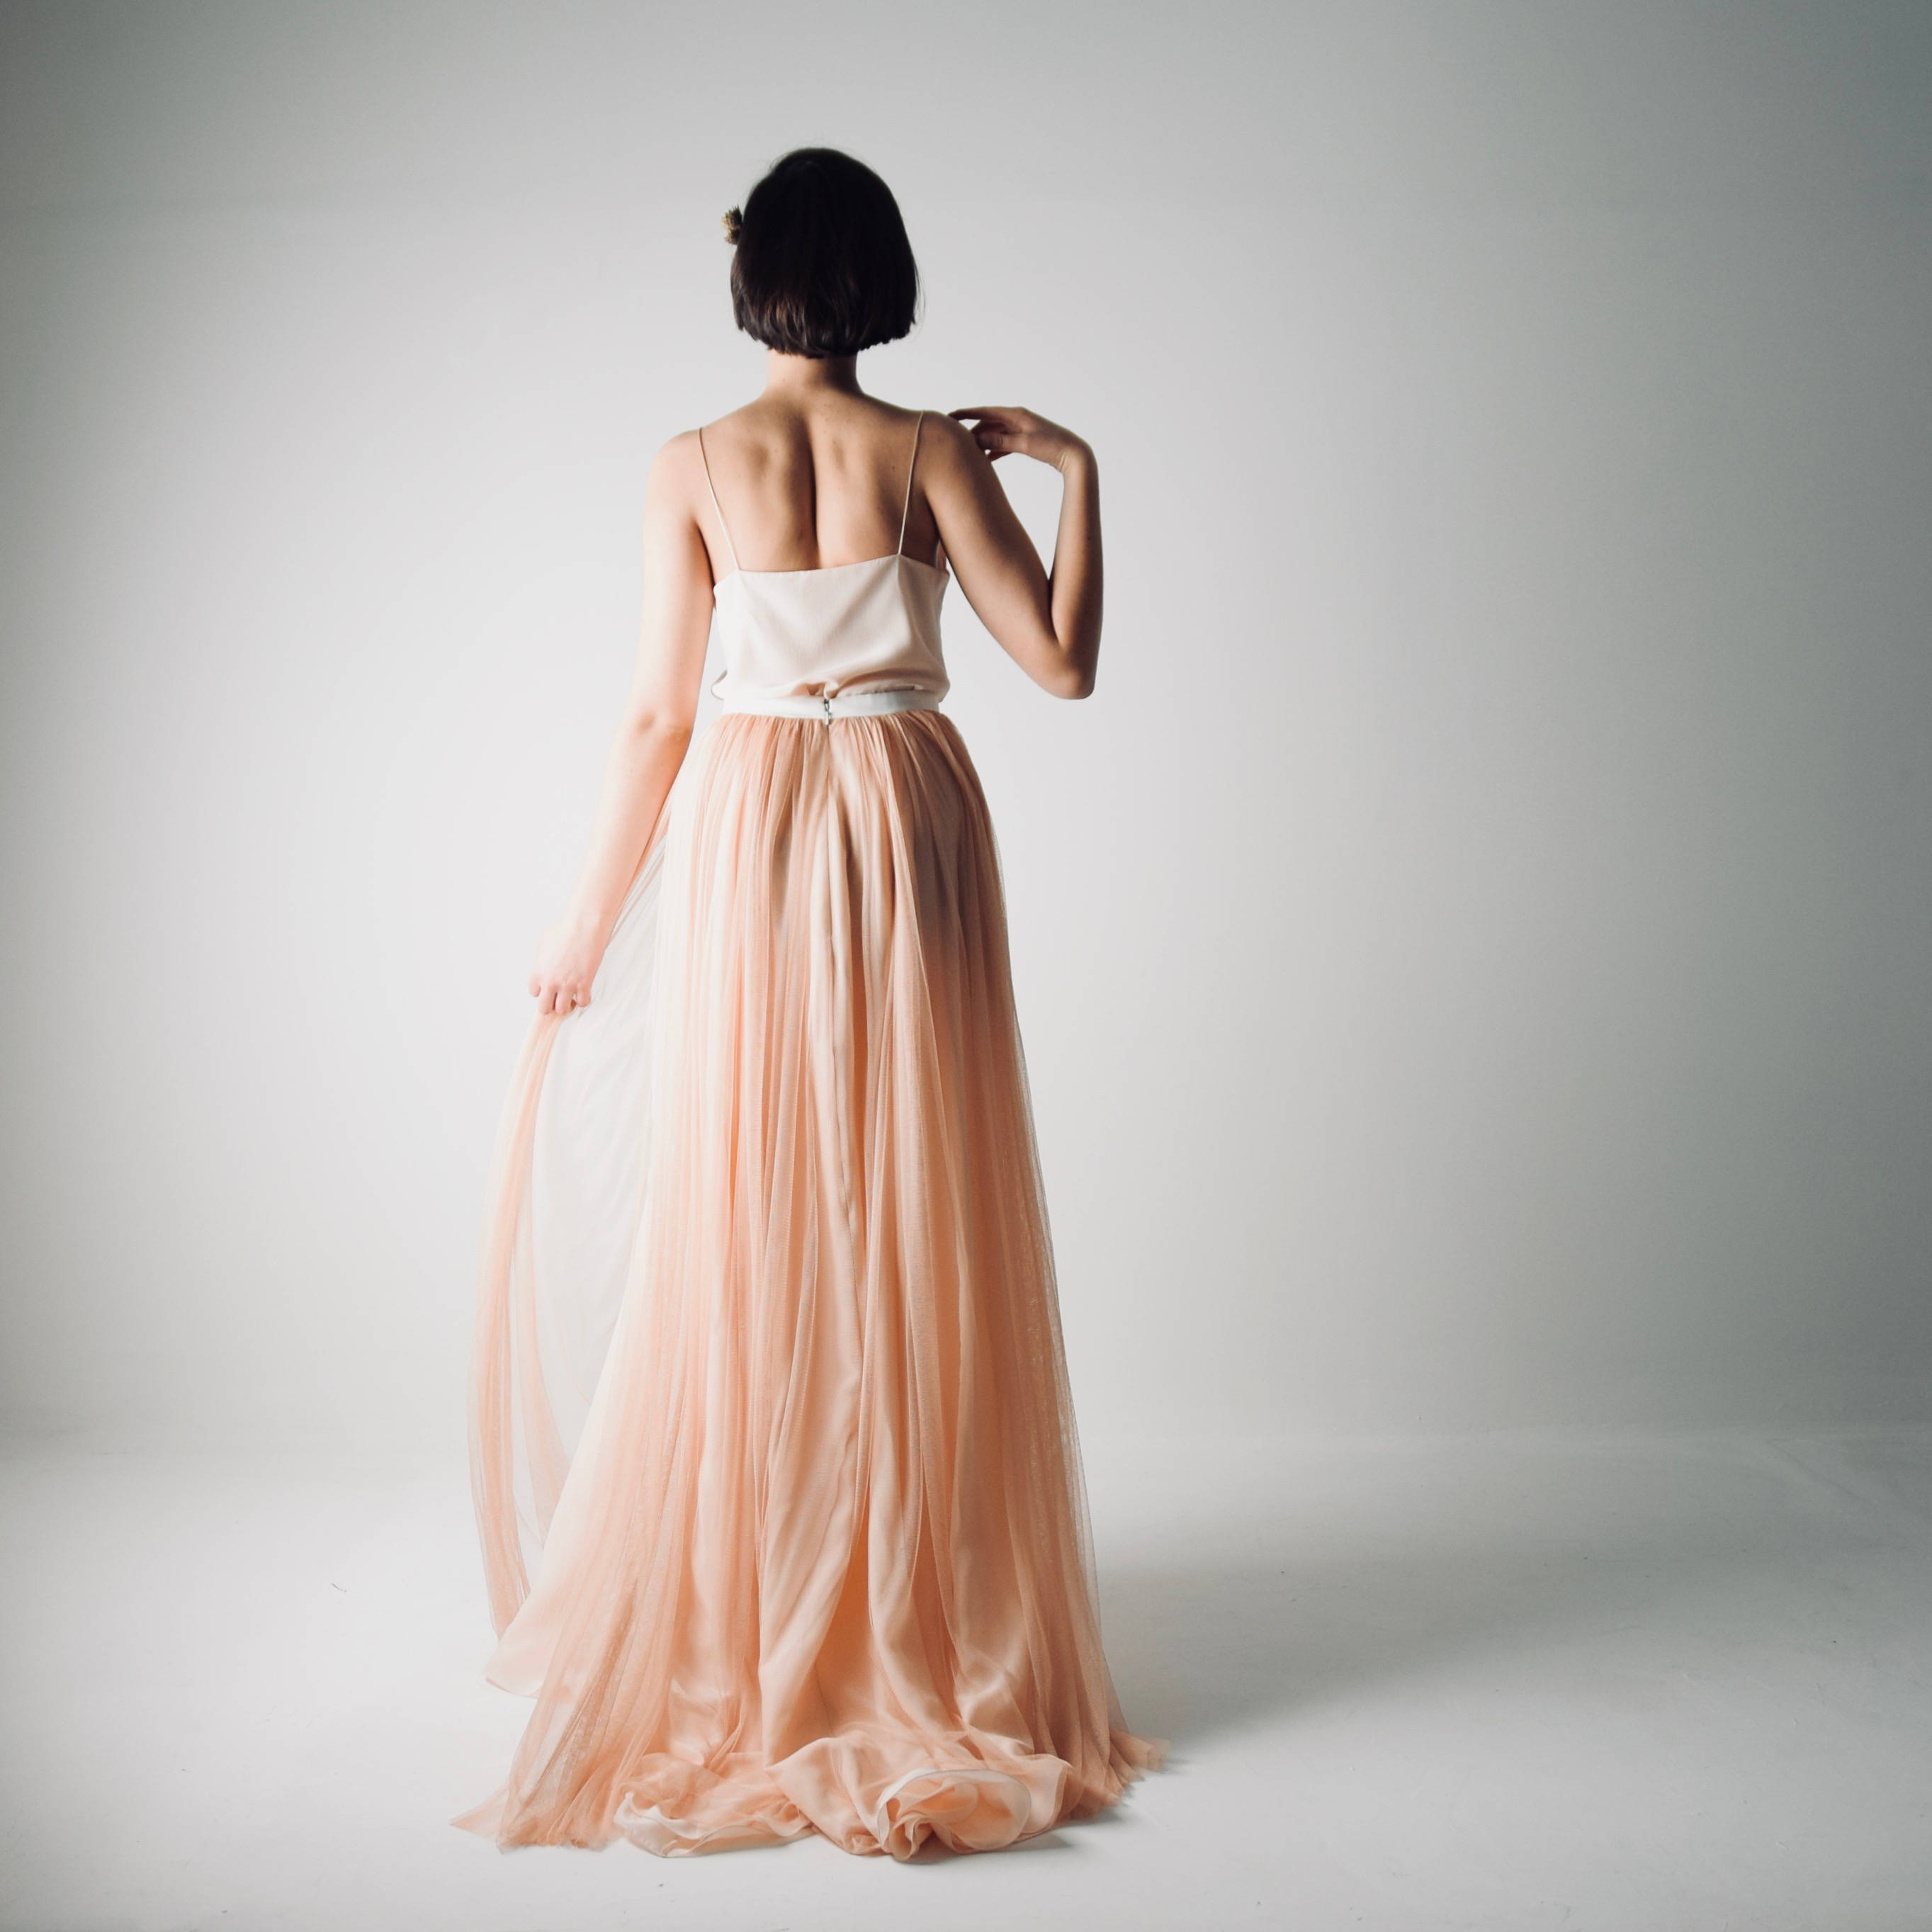 Blush wedding dress separates tulle and silk skirt and top larimeloom abelia blush wedding dress separates tulle skirt and top junglespirit Images